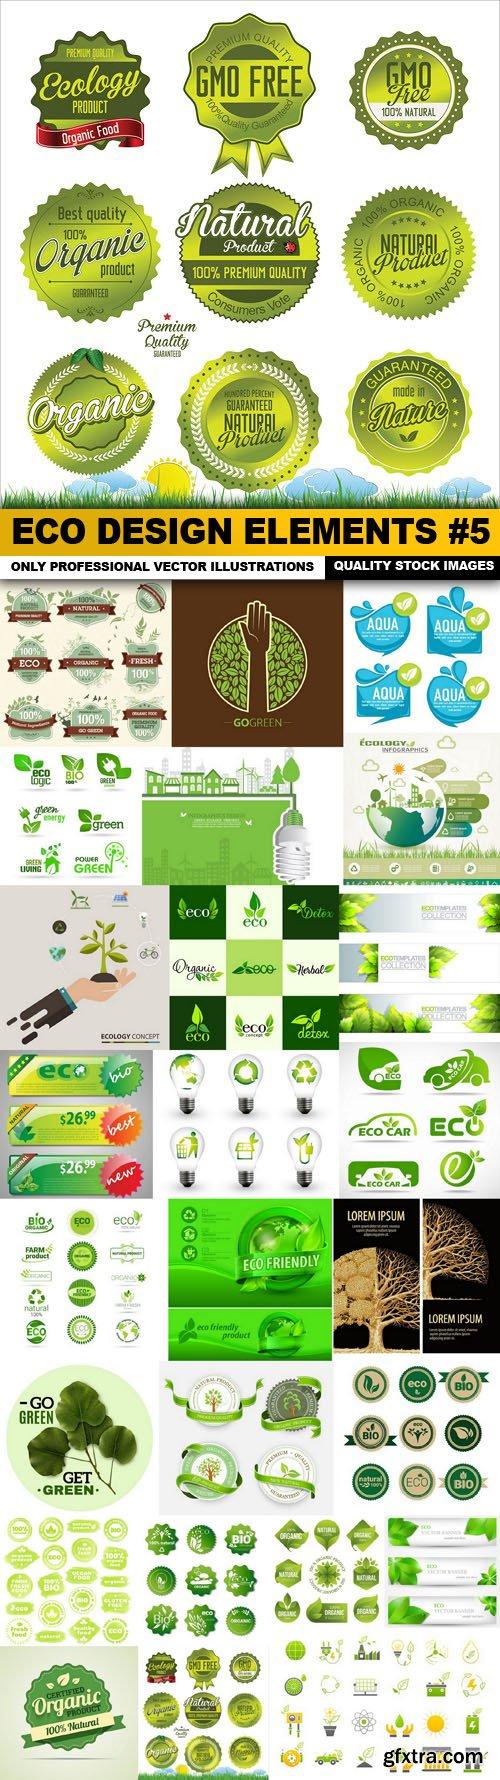 ECO Design Elements #5 - 25 Vector